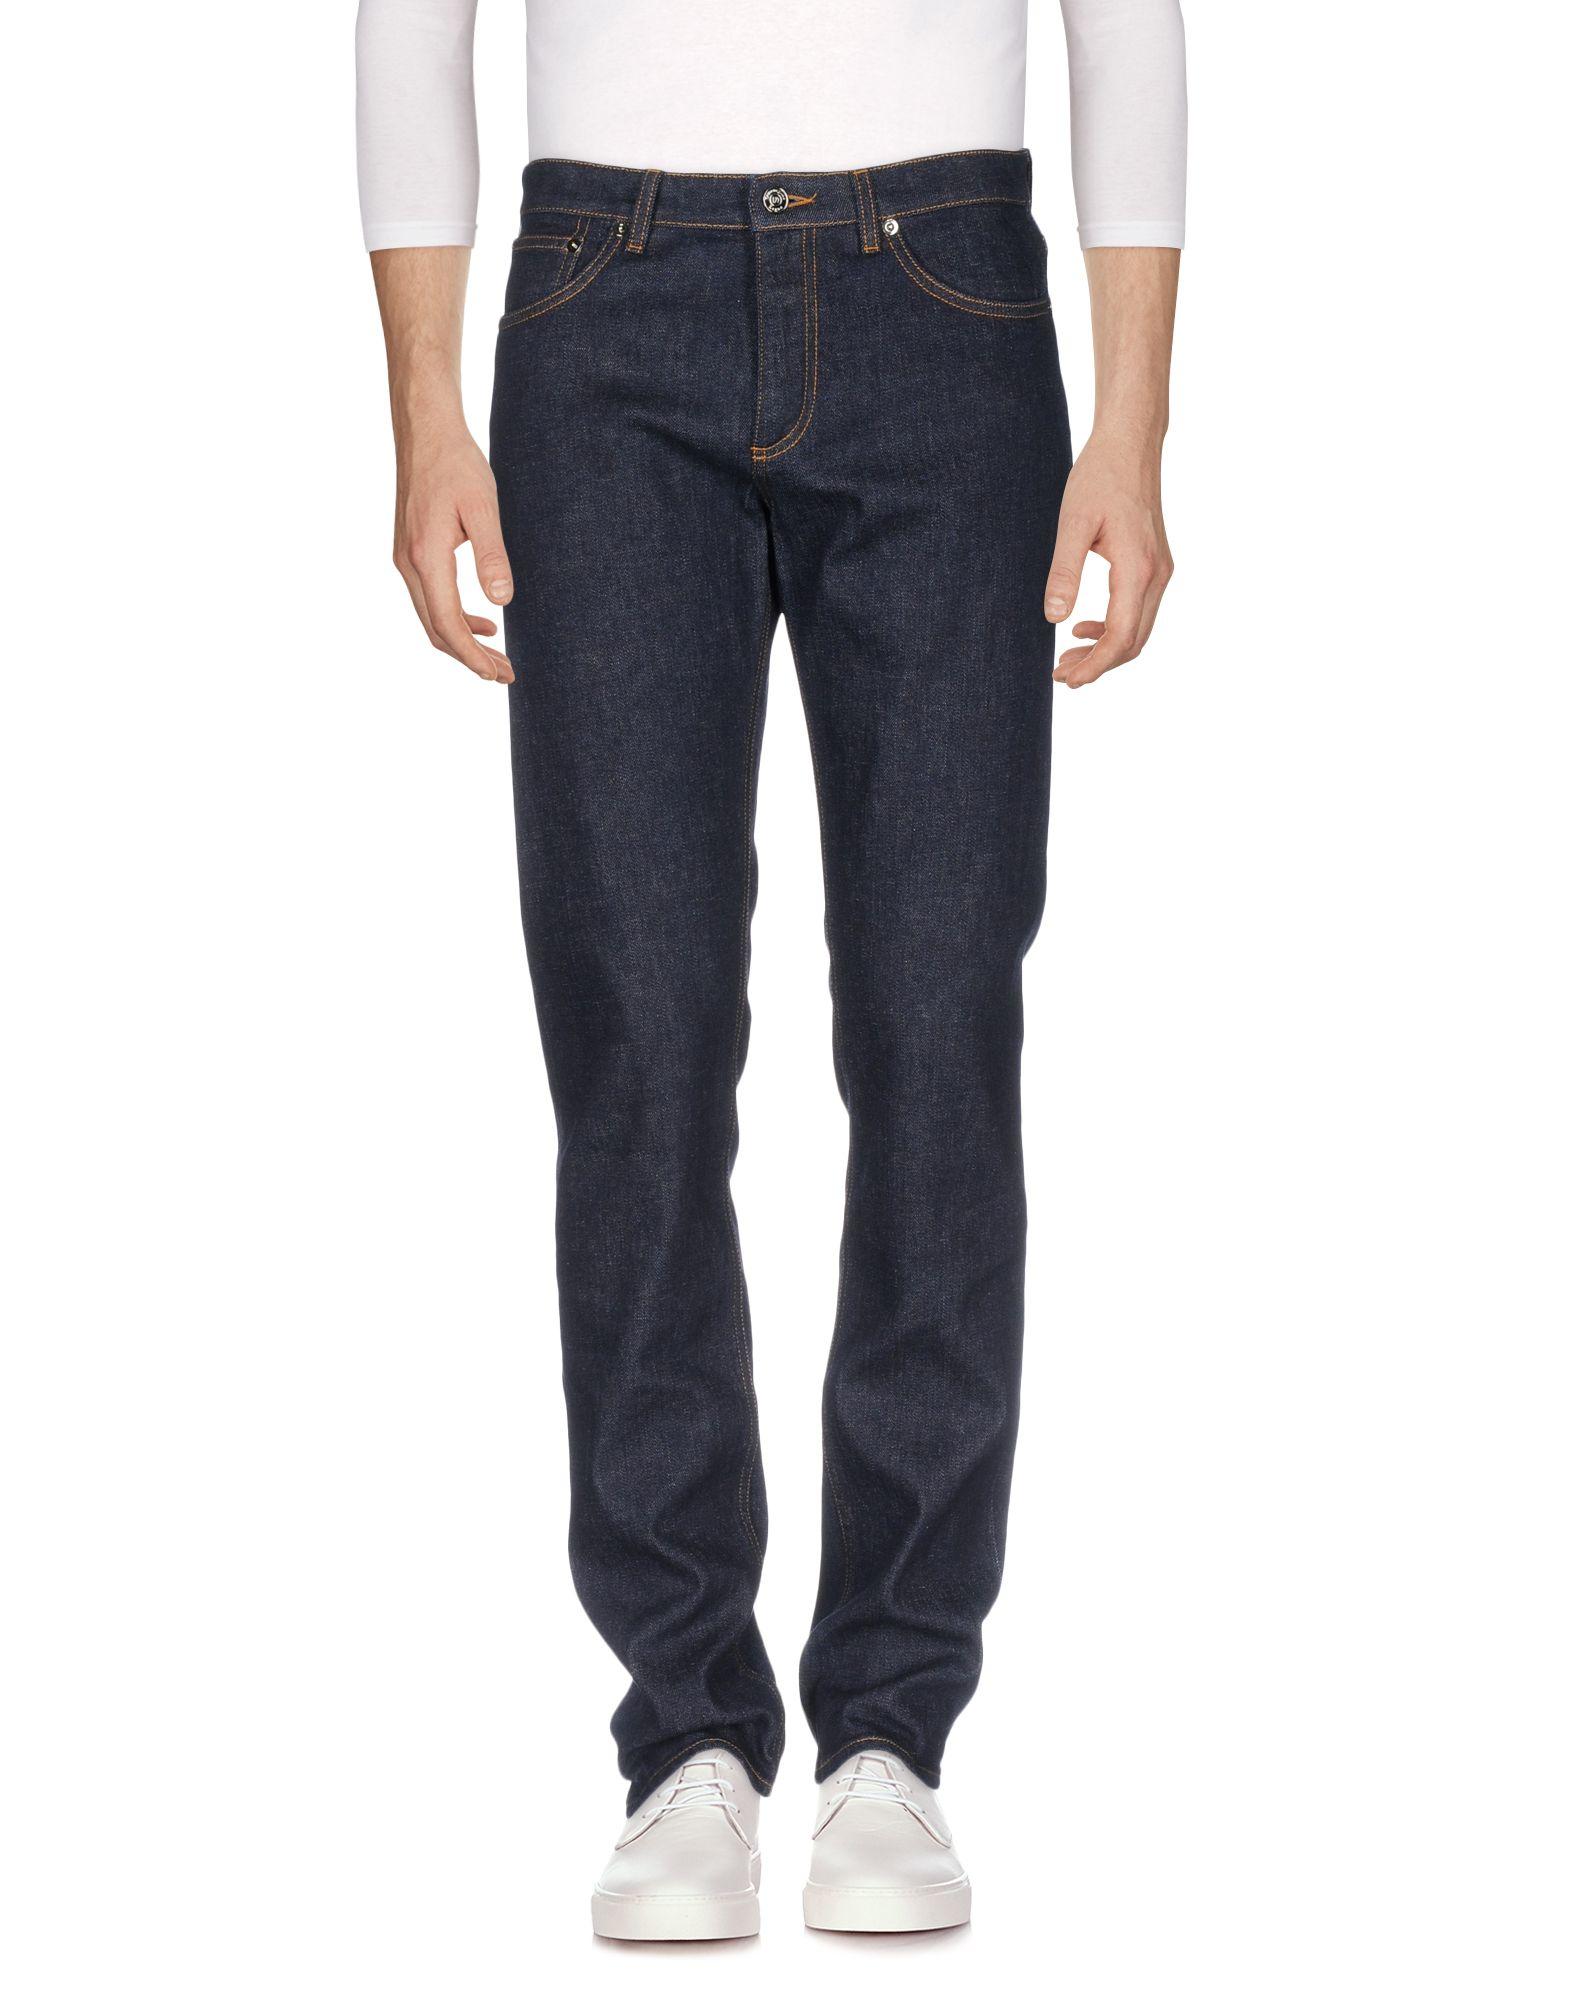 Pantaloni Jeans Ermenegildo Zegna Uomo - Acquista online su